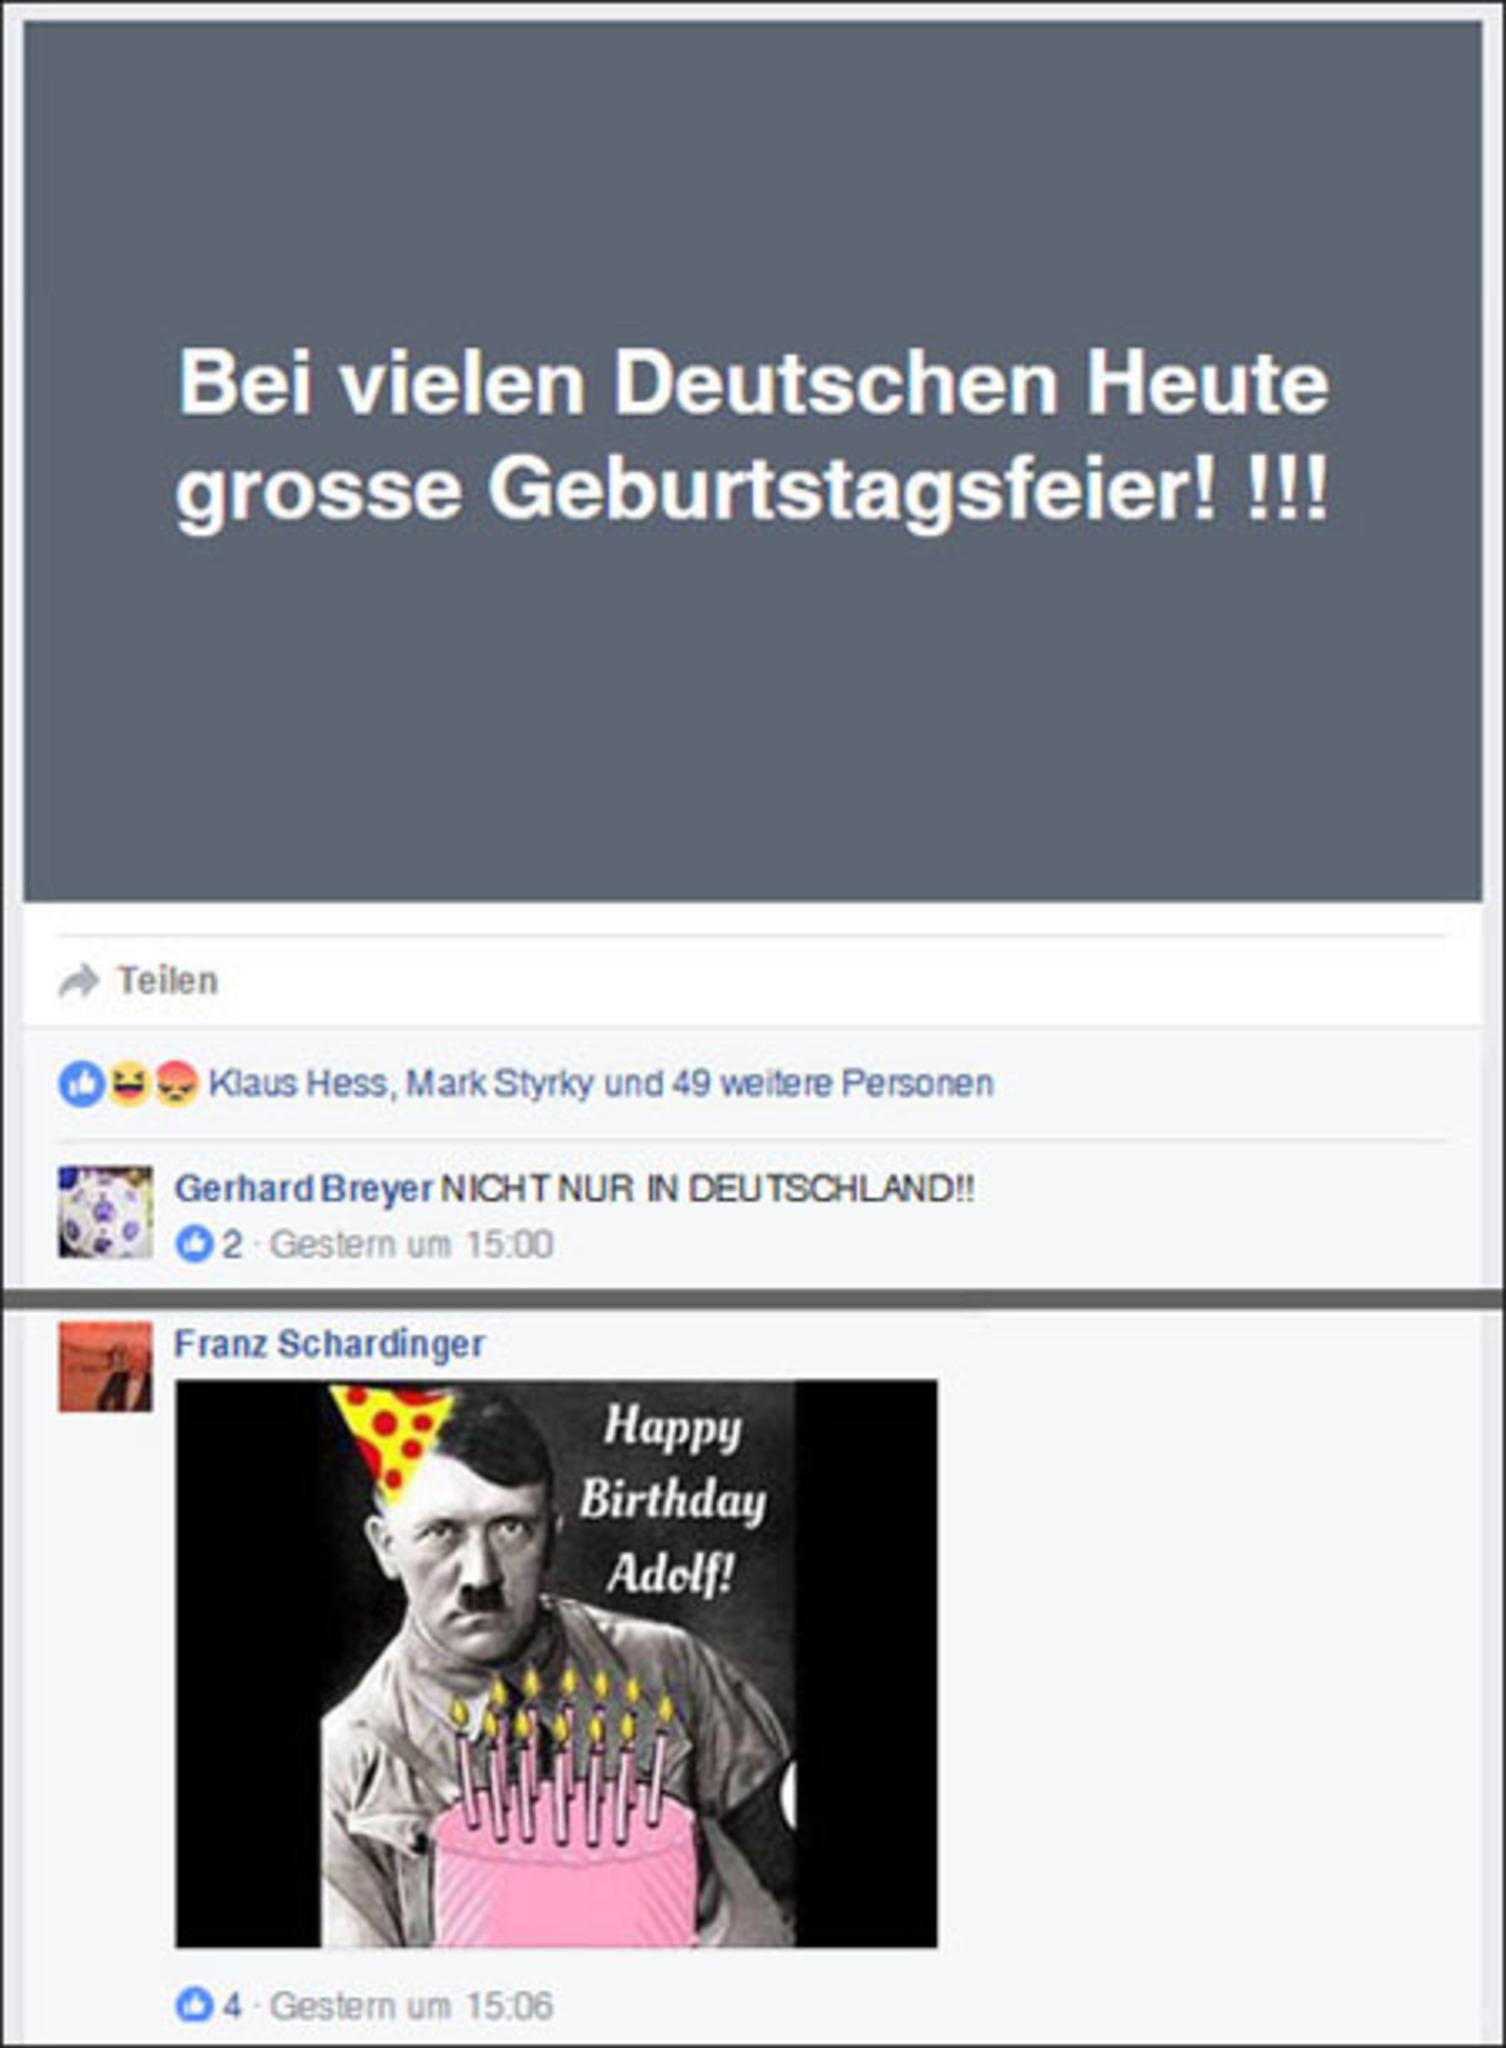 Heute wer hitler hat geburtstag Geburtstag Hitler